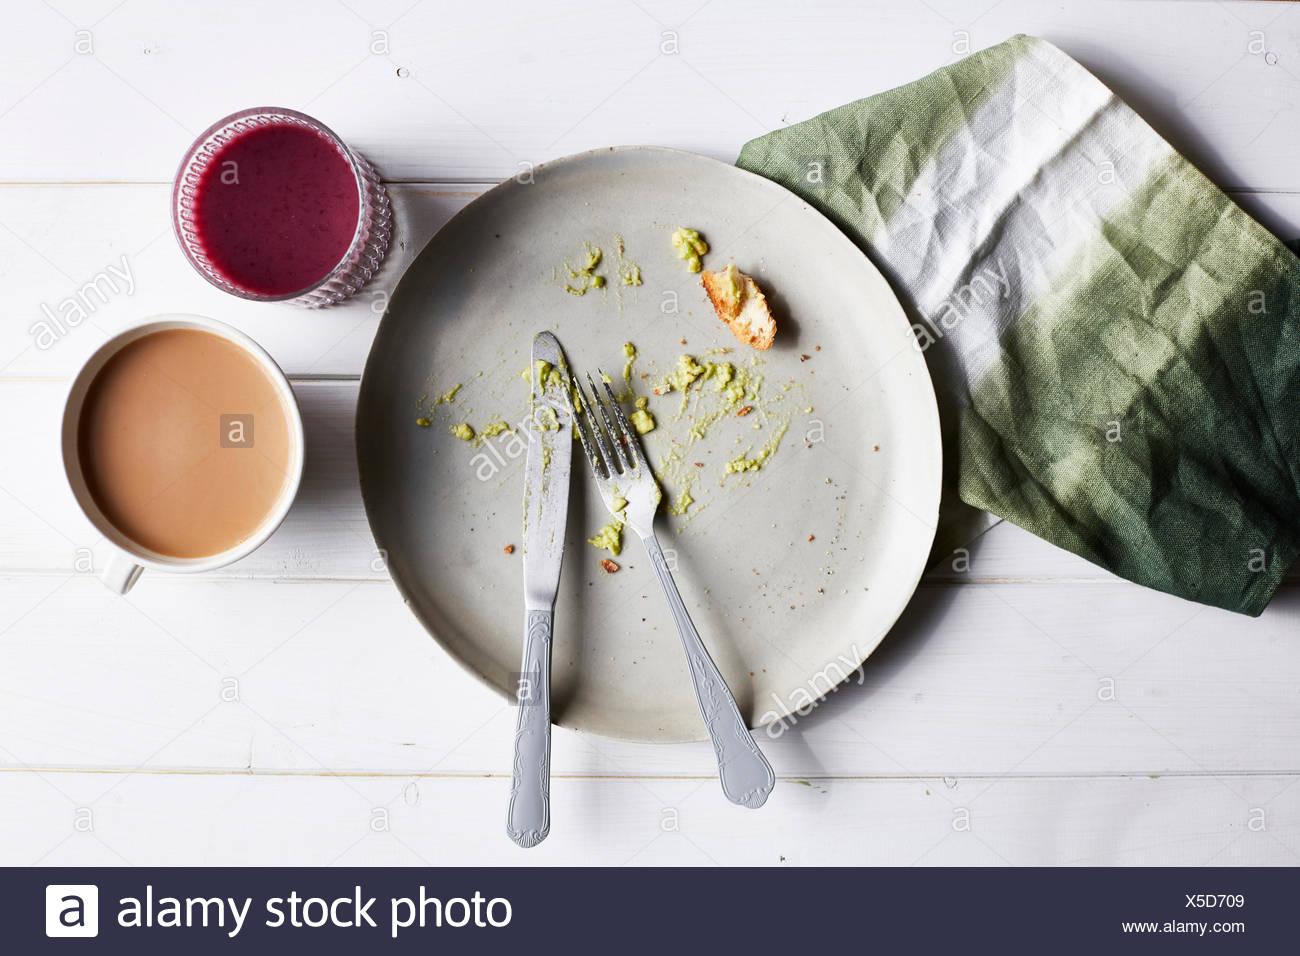 Comer comida de aguacate, vista superior Imagen De Stock